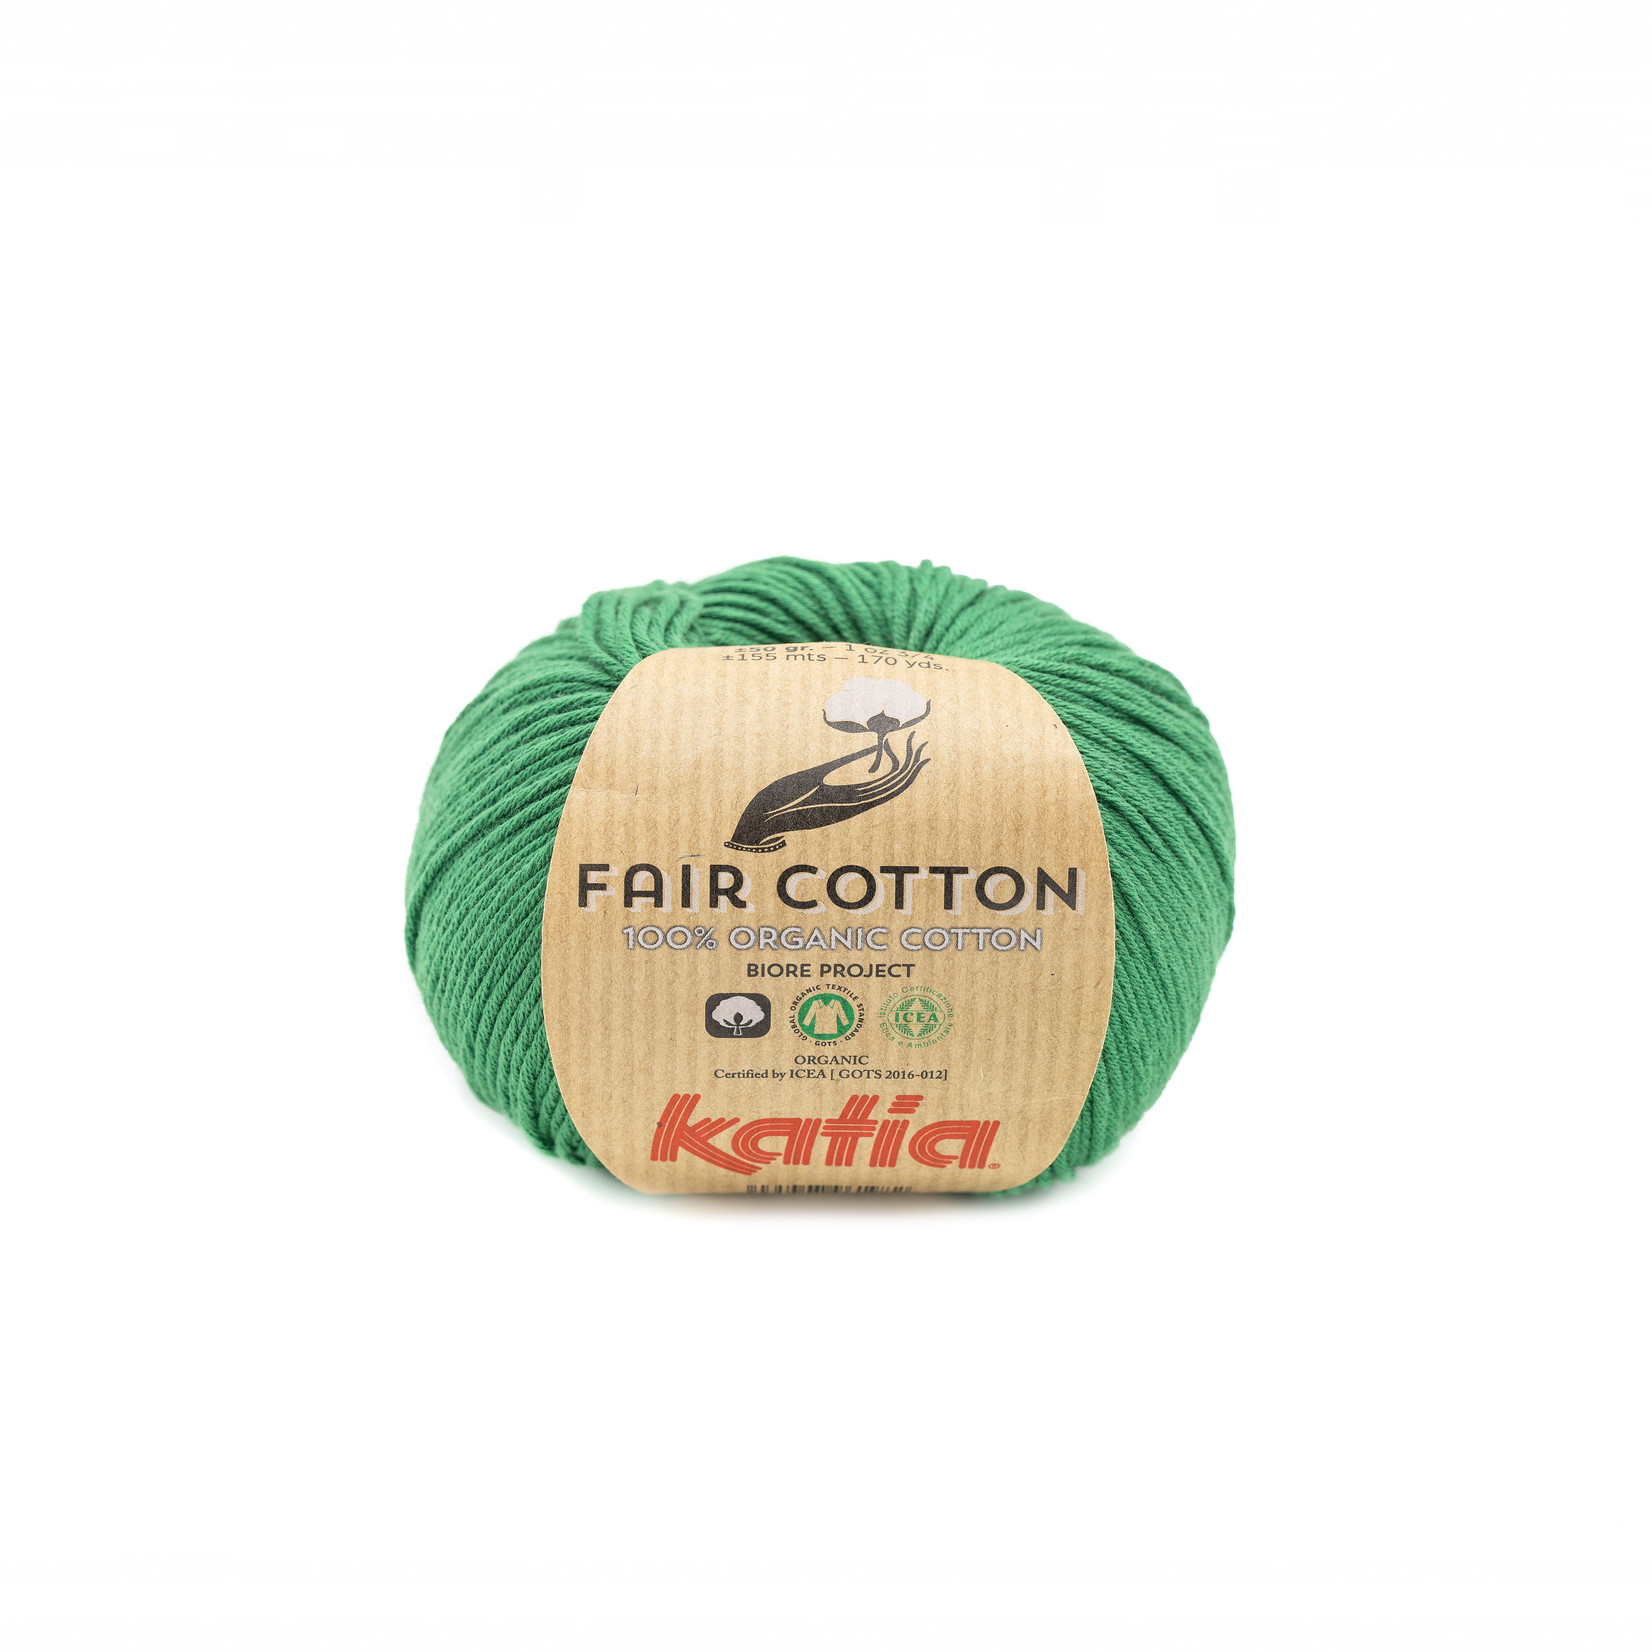 Katia Katia Fair Cotton 42 - flessegroen - 1 bol = 50 gr. = 155 m. - 100% biol. katoen